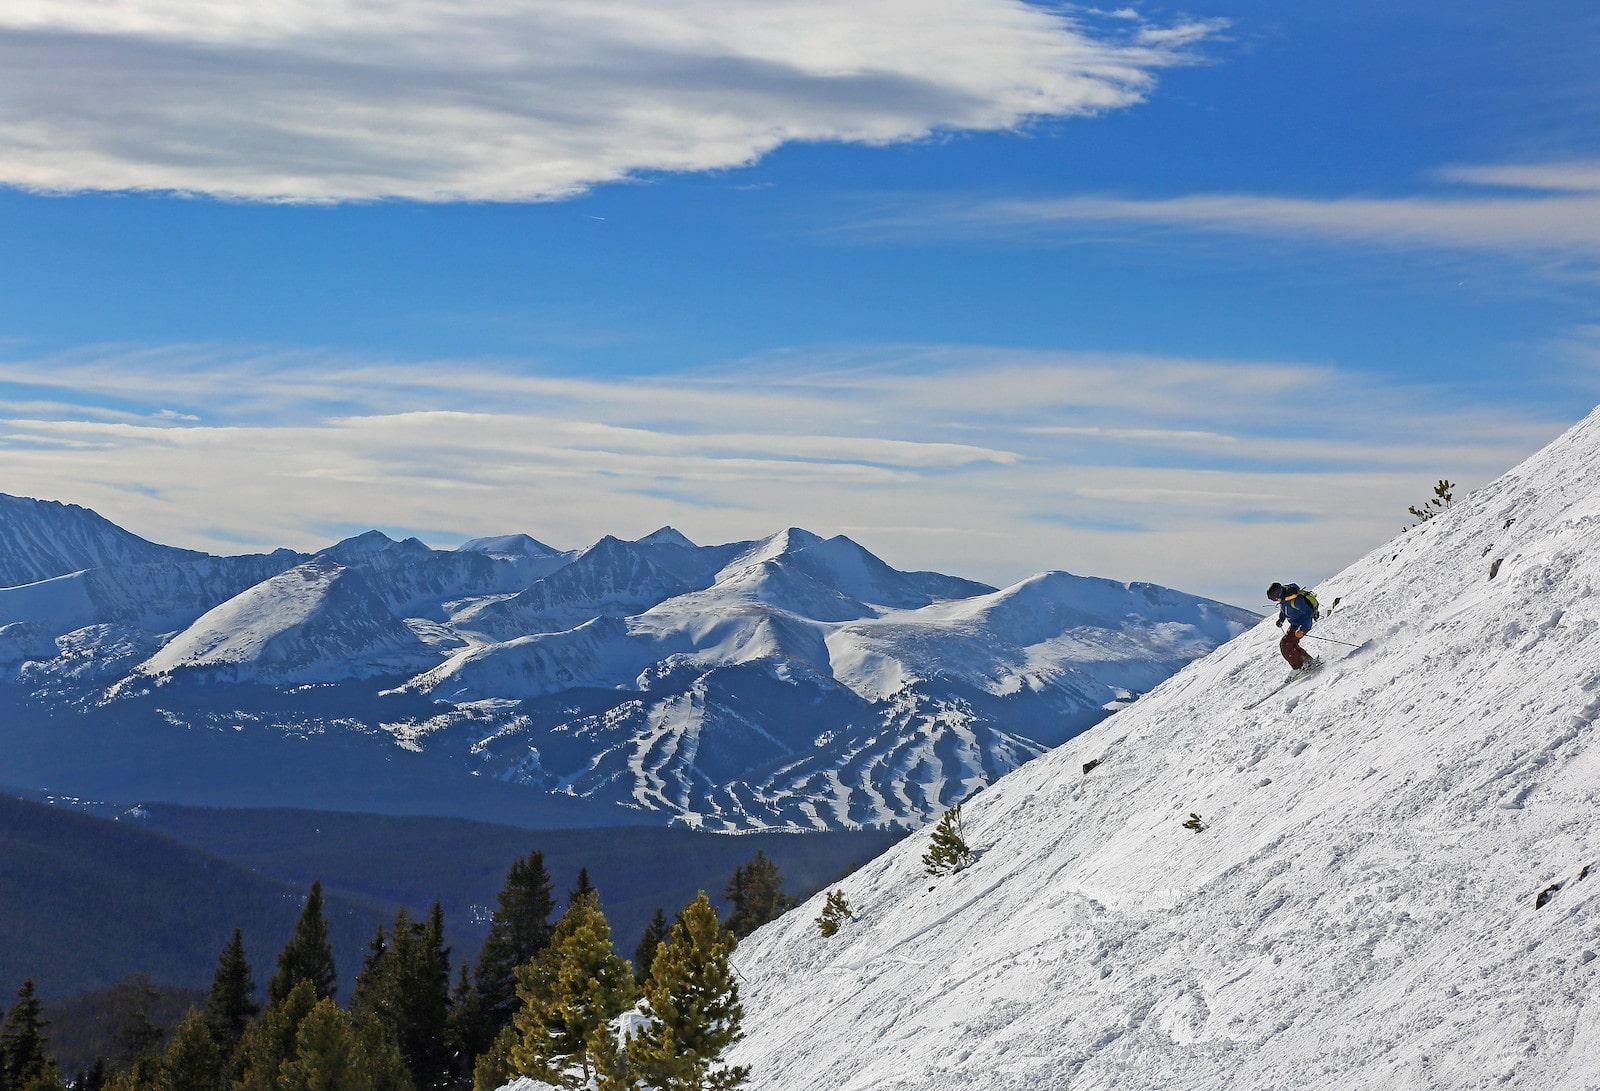 Skiing at Keystone Resort, CO